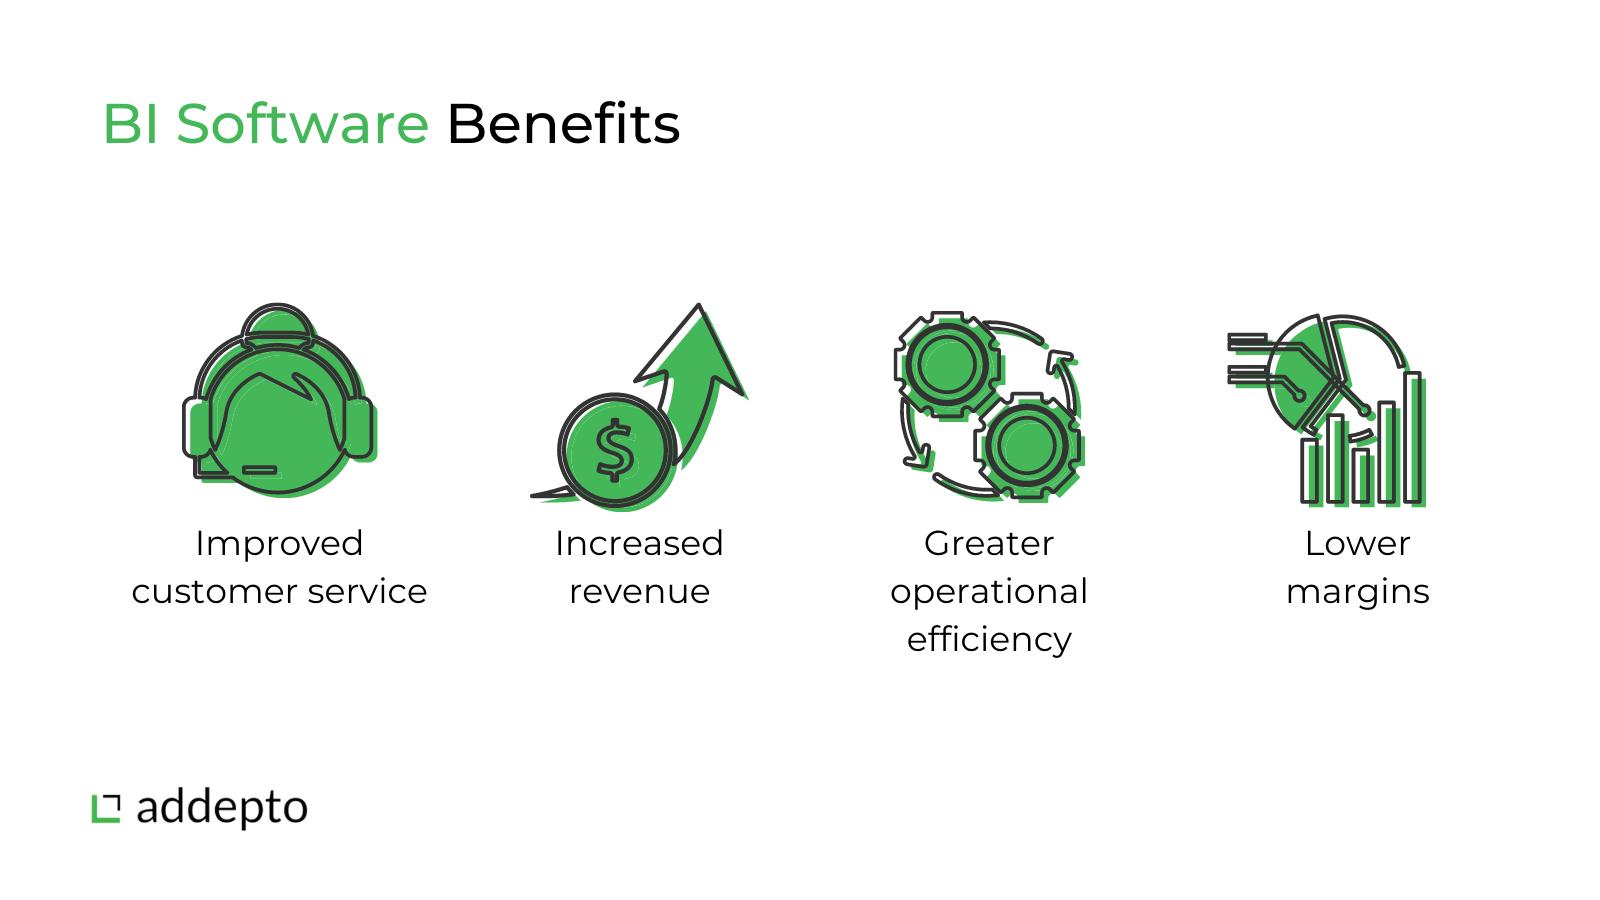 business intelligence software benefits